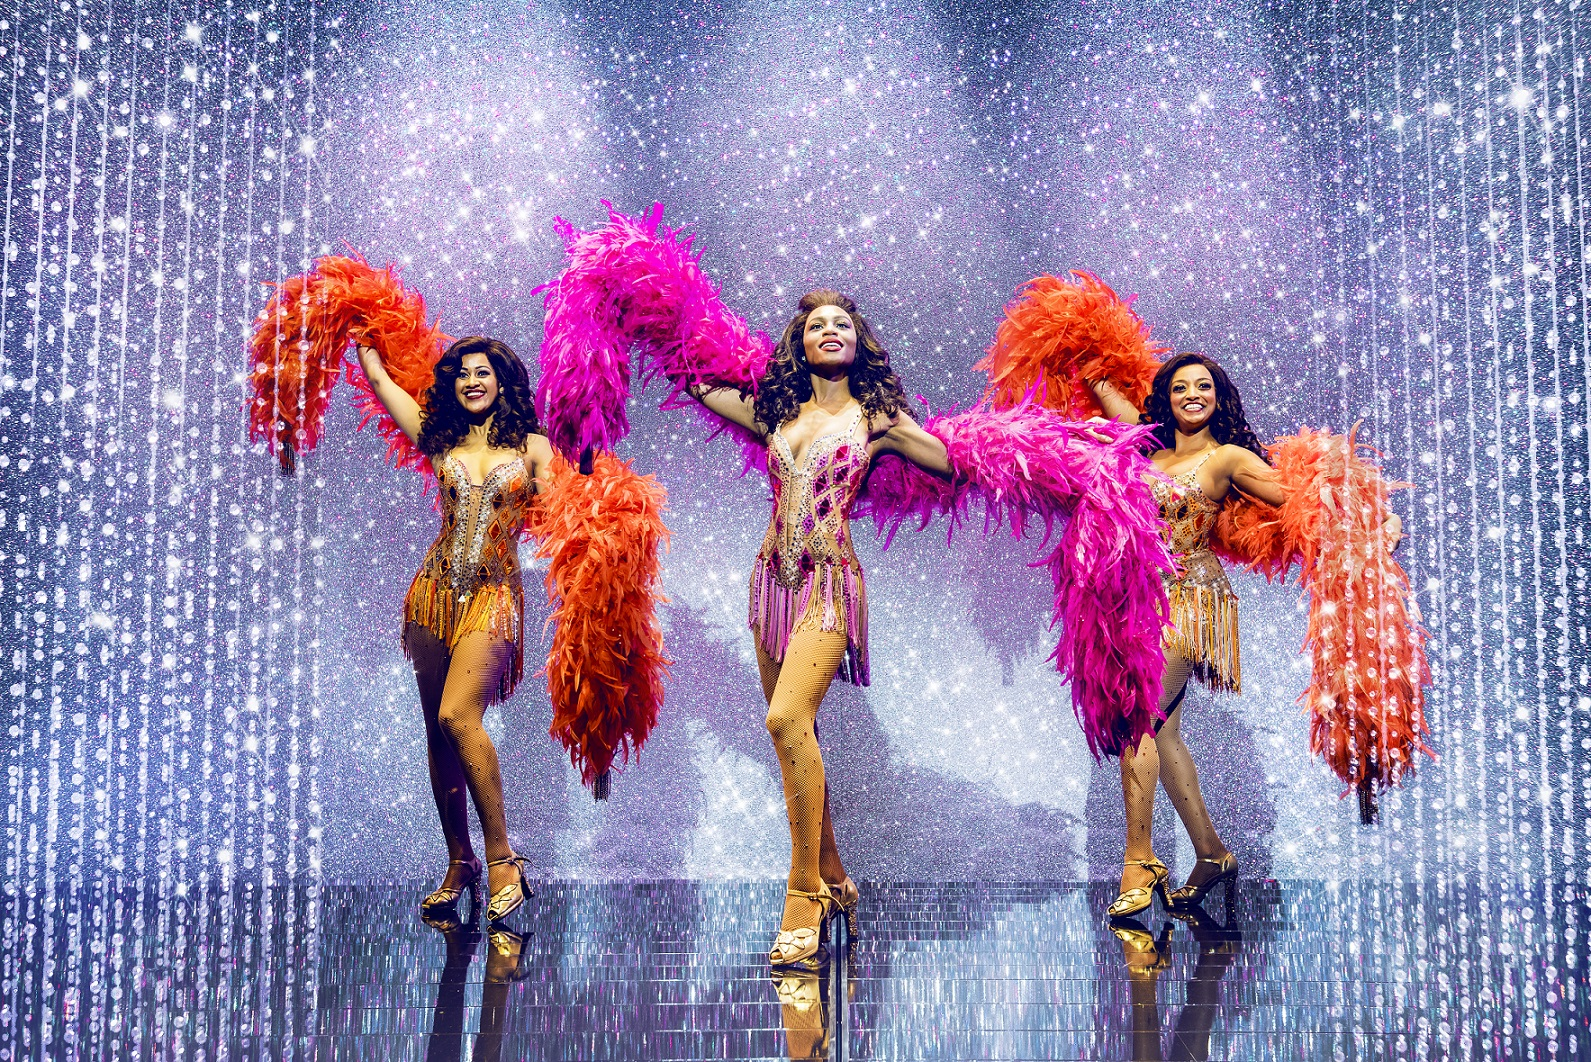 Kimmy-Edwards-Brennyn-Lark-and-Asmeret-Ghebremichael-in-Dreamgirls-at-the-Savoy-Theatre.-Credit-Dewynters.jpg